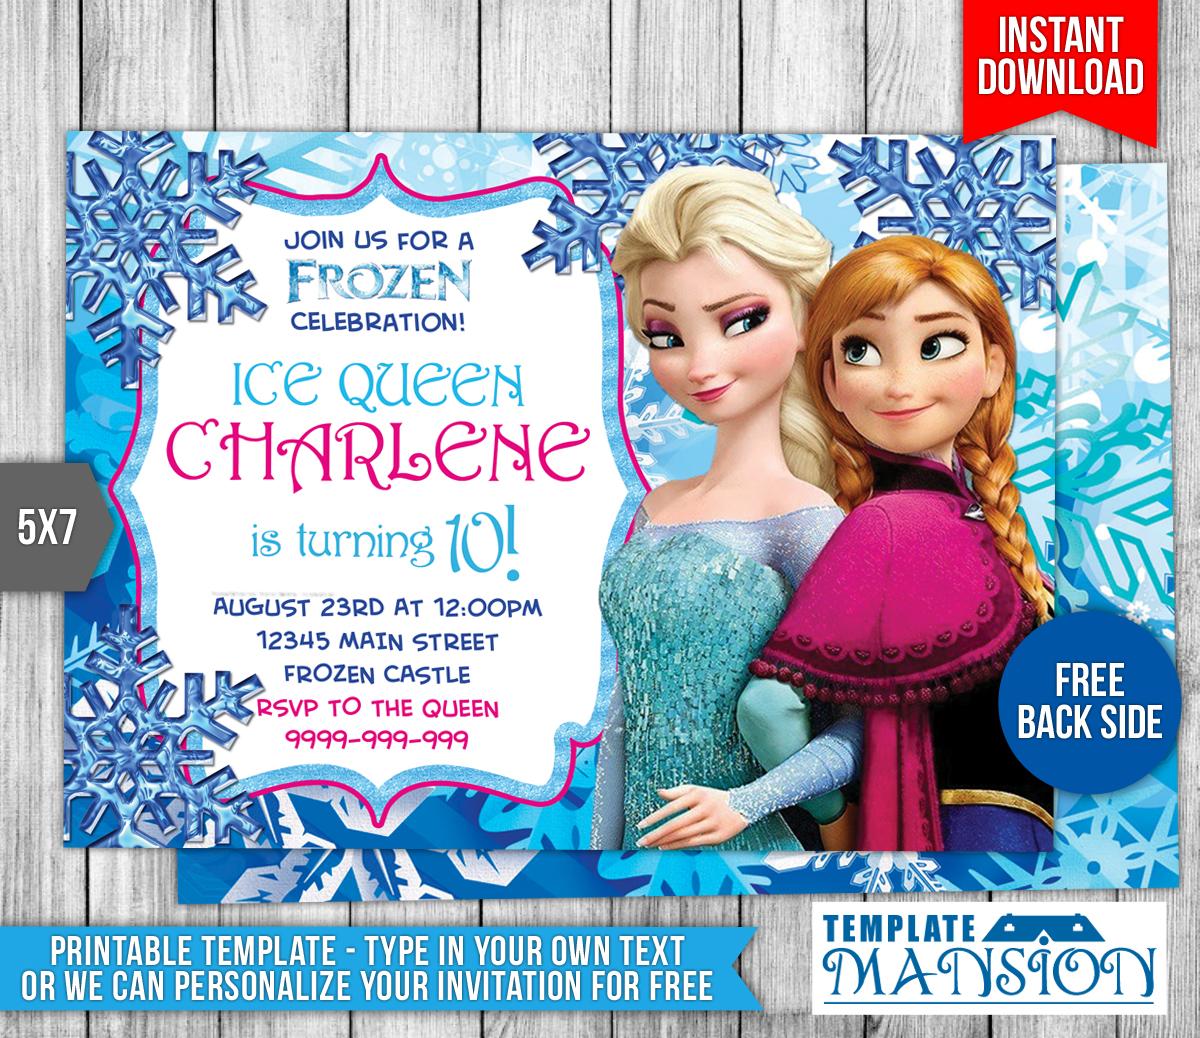 Disney Frozen Birthday Invitation By Templatemansion On